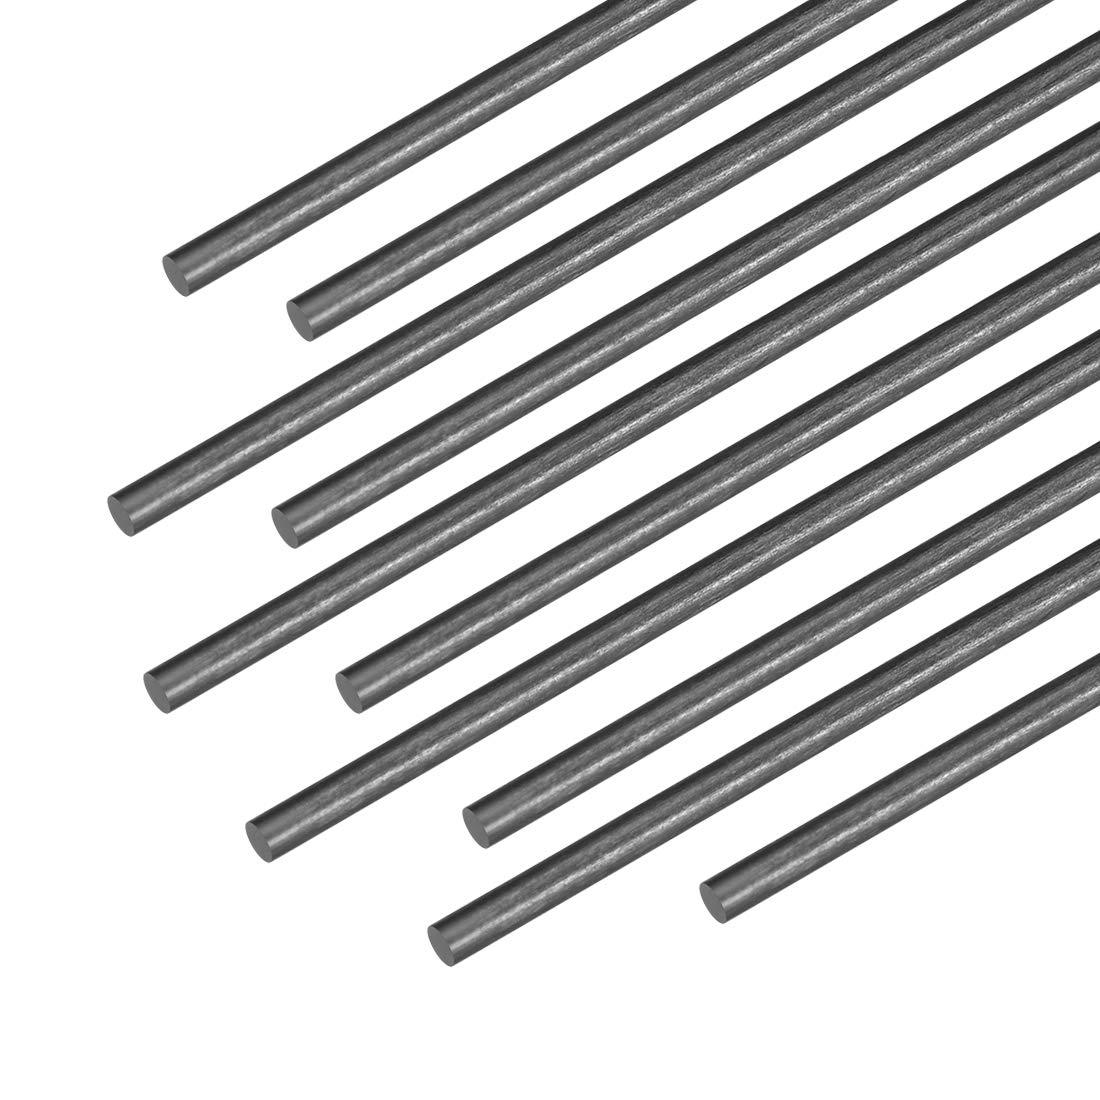 sourcing map 3mm Carbon Fiber Bar For RC Airplane Matte Pole US, 200mm 7.8 inch, 10pcs